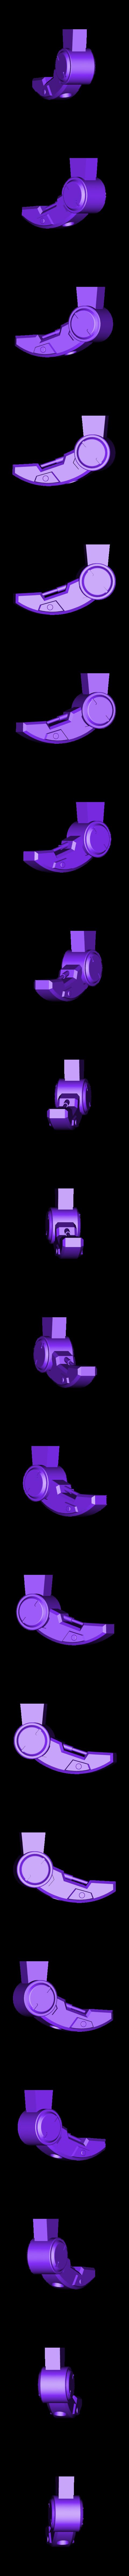 Leg-RightFront.stl Download STL file Hammond's Wrecking Ball Mech from Overwatch • 3D printer template, FunbieStudios